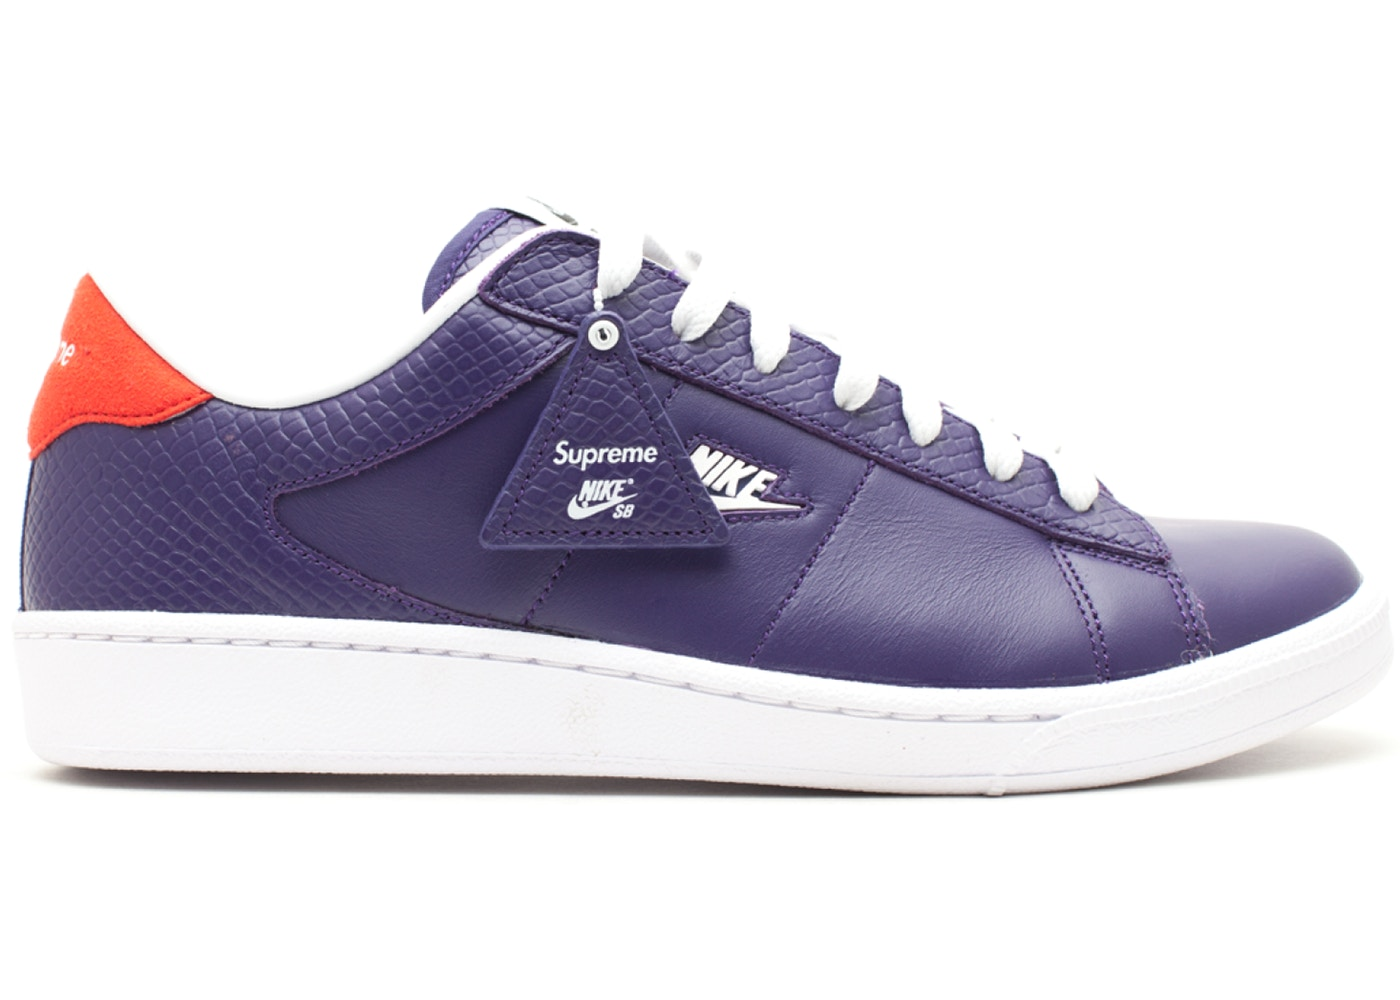 Nike SB Tennis Classic Supreme Ink - 556045-516